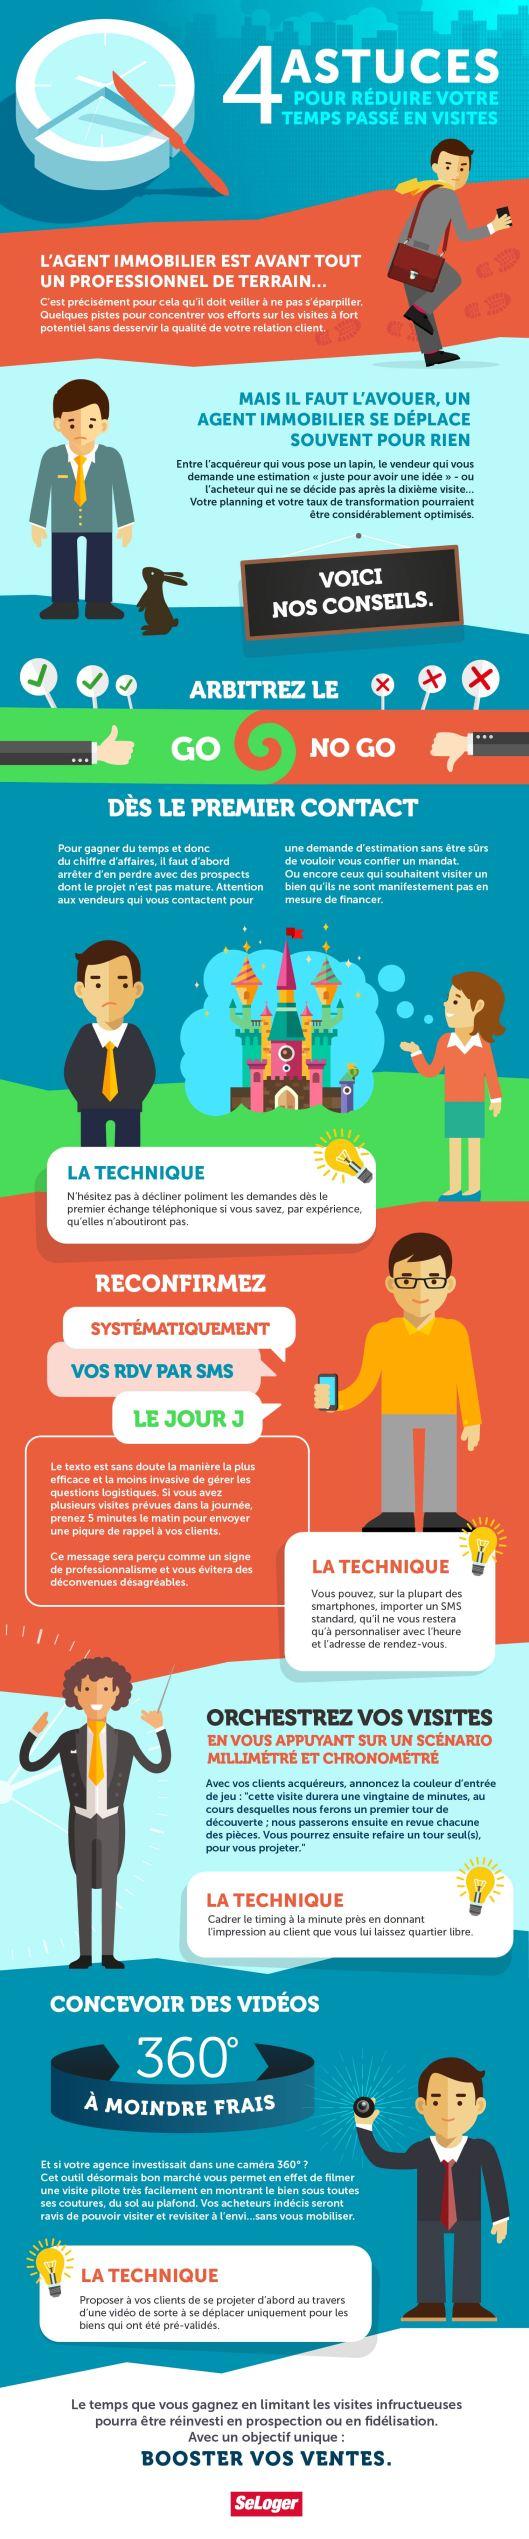 infographie_astuces